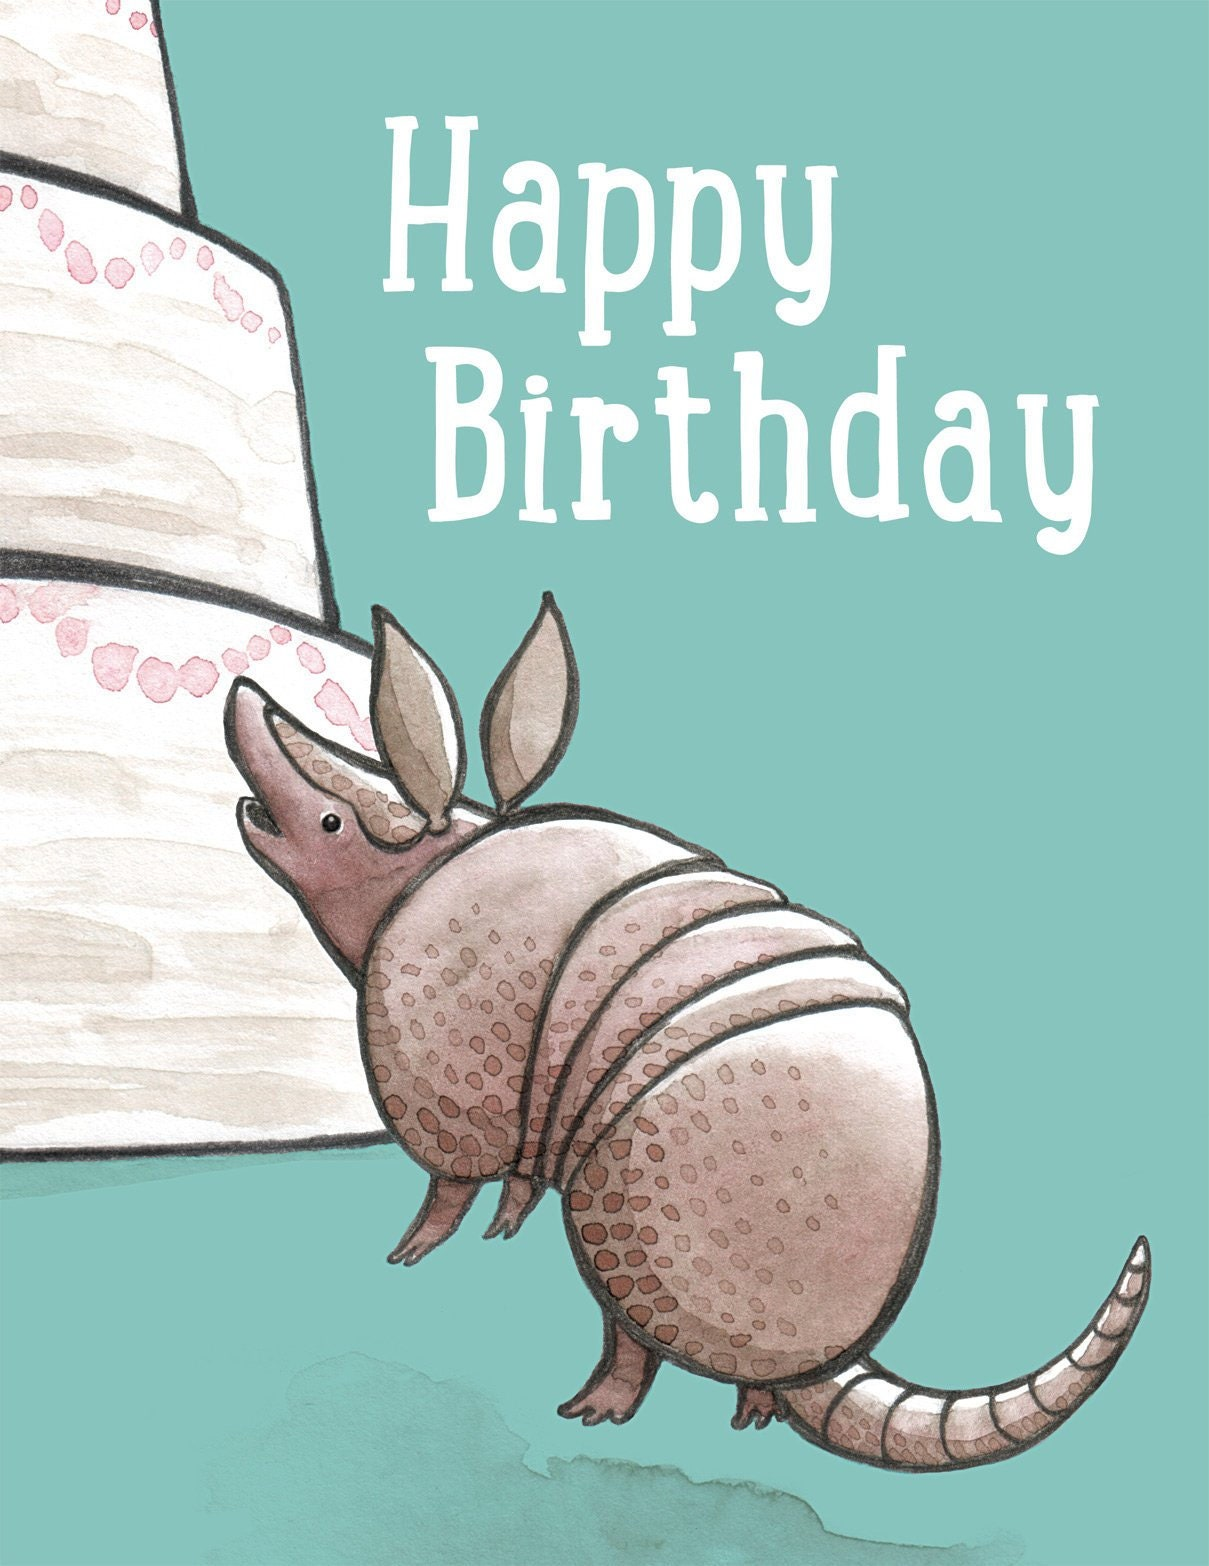 Cute Animal Birthday Card Blank Inside Card For Kids